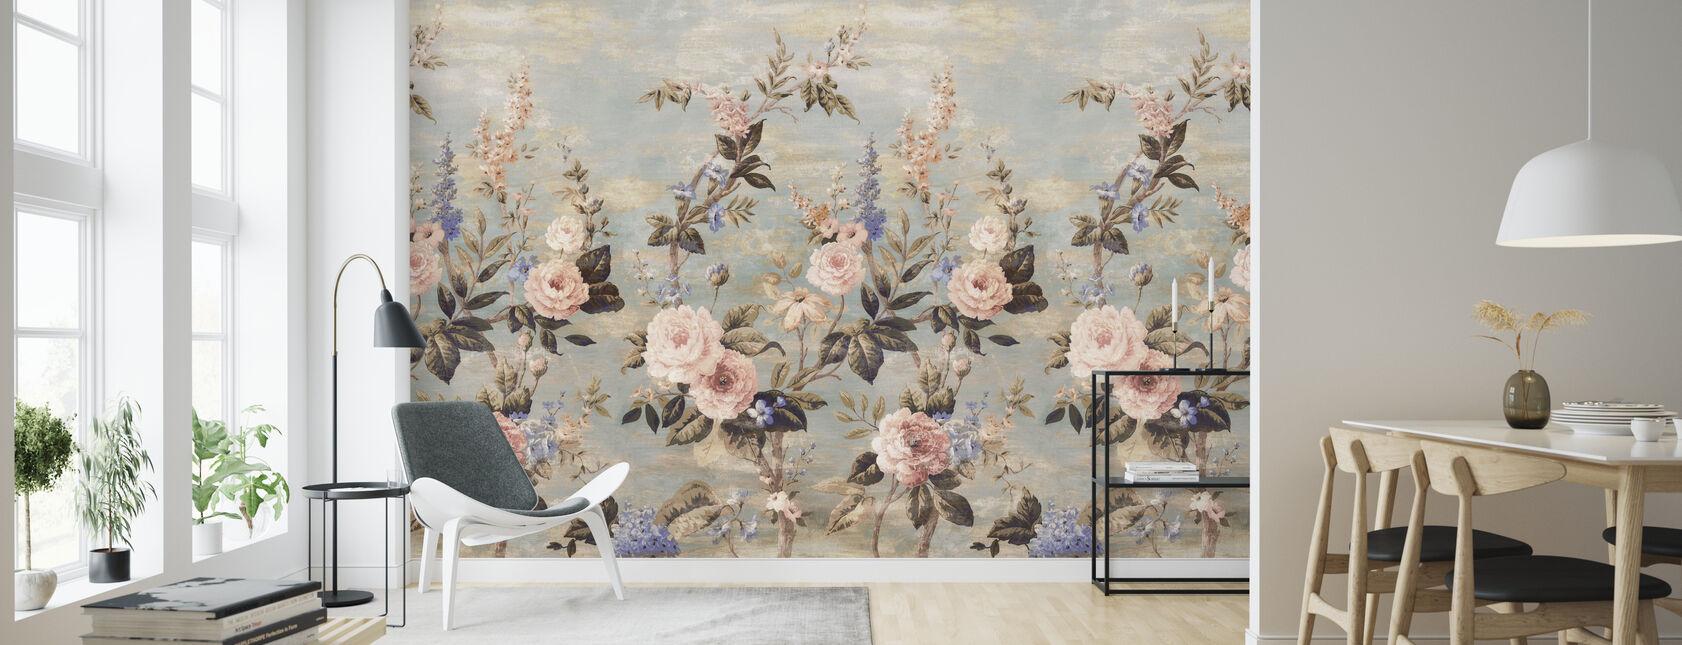 Fairy Tale Botanic - Wallpaper - Living Room